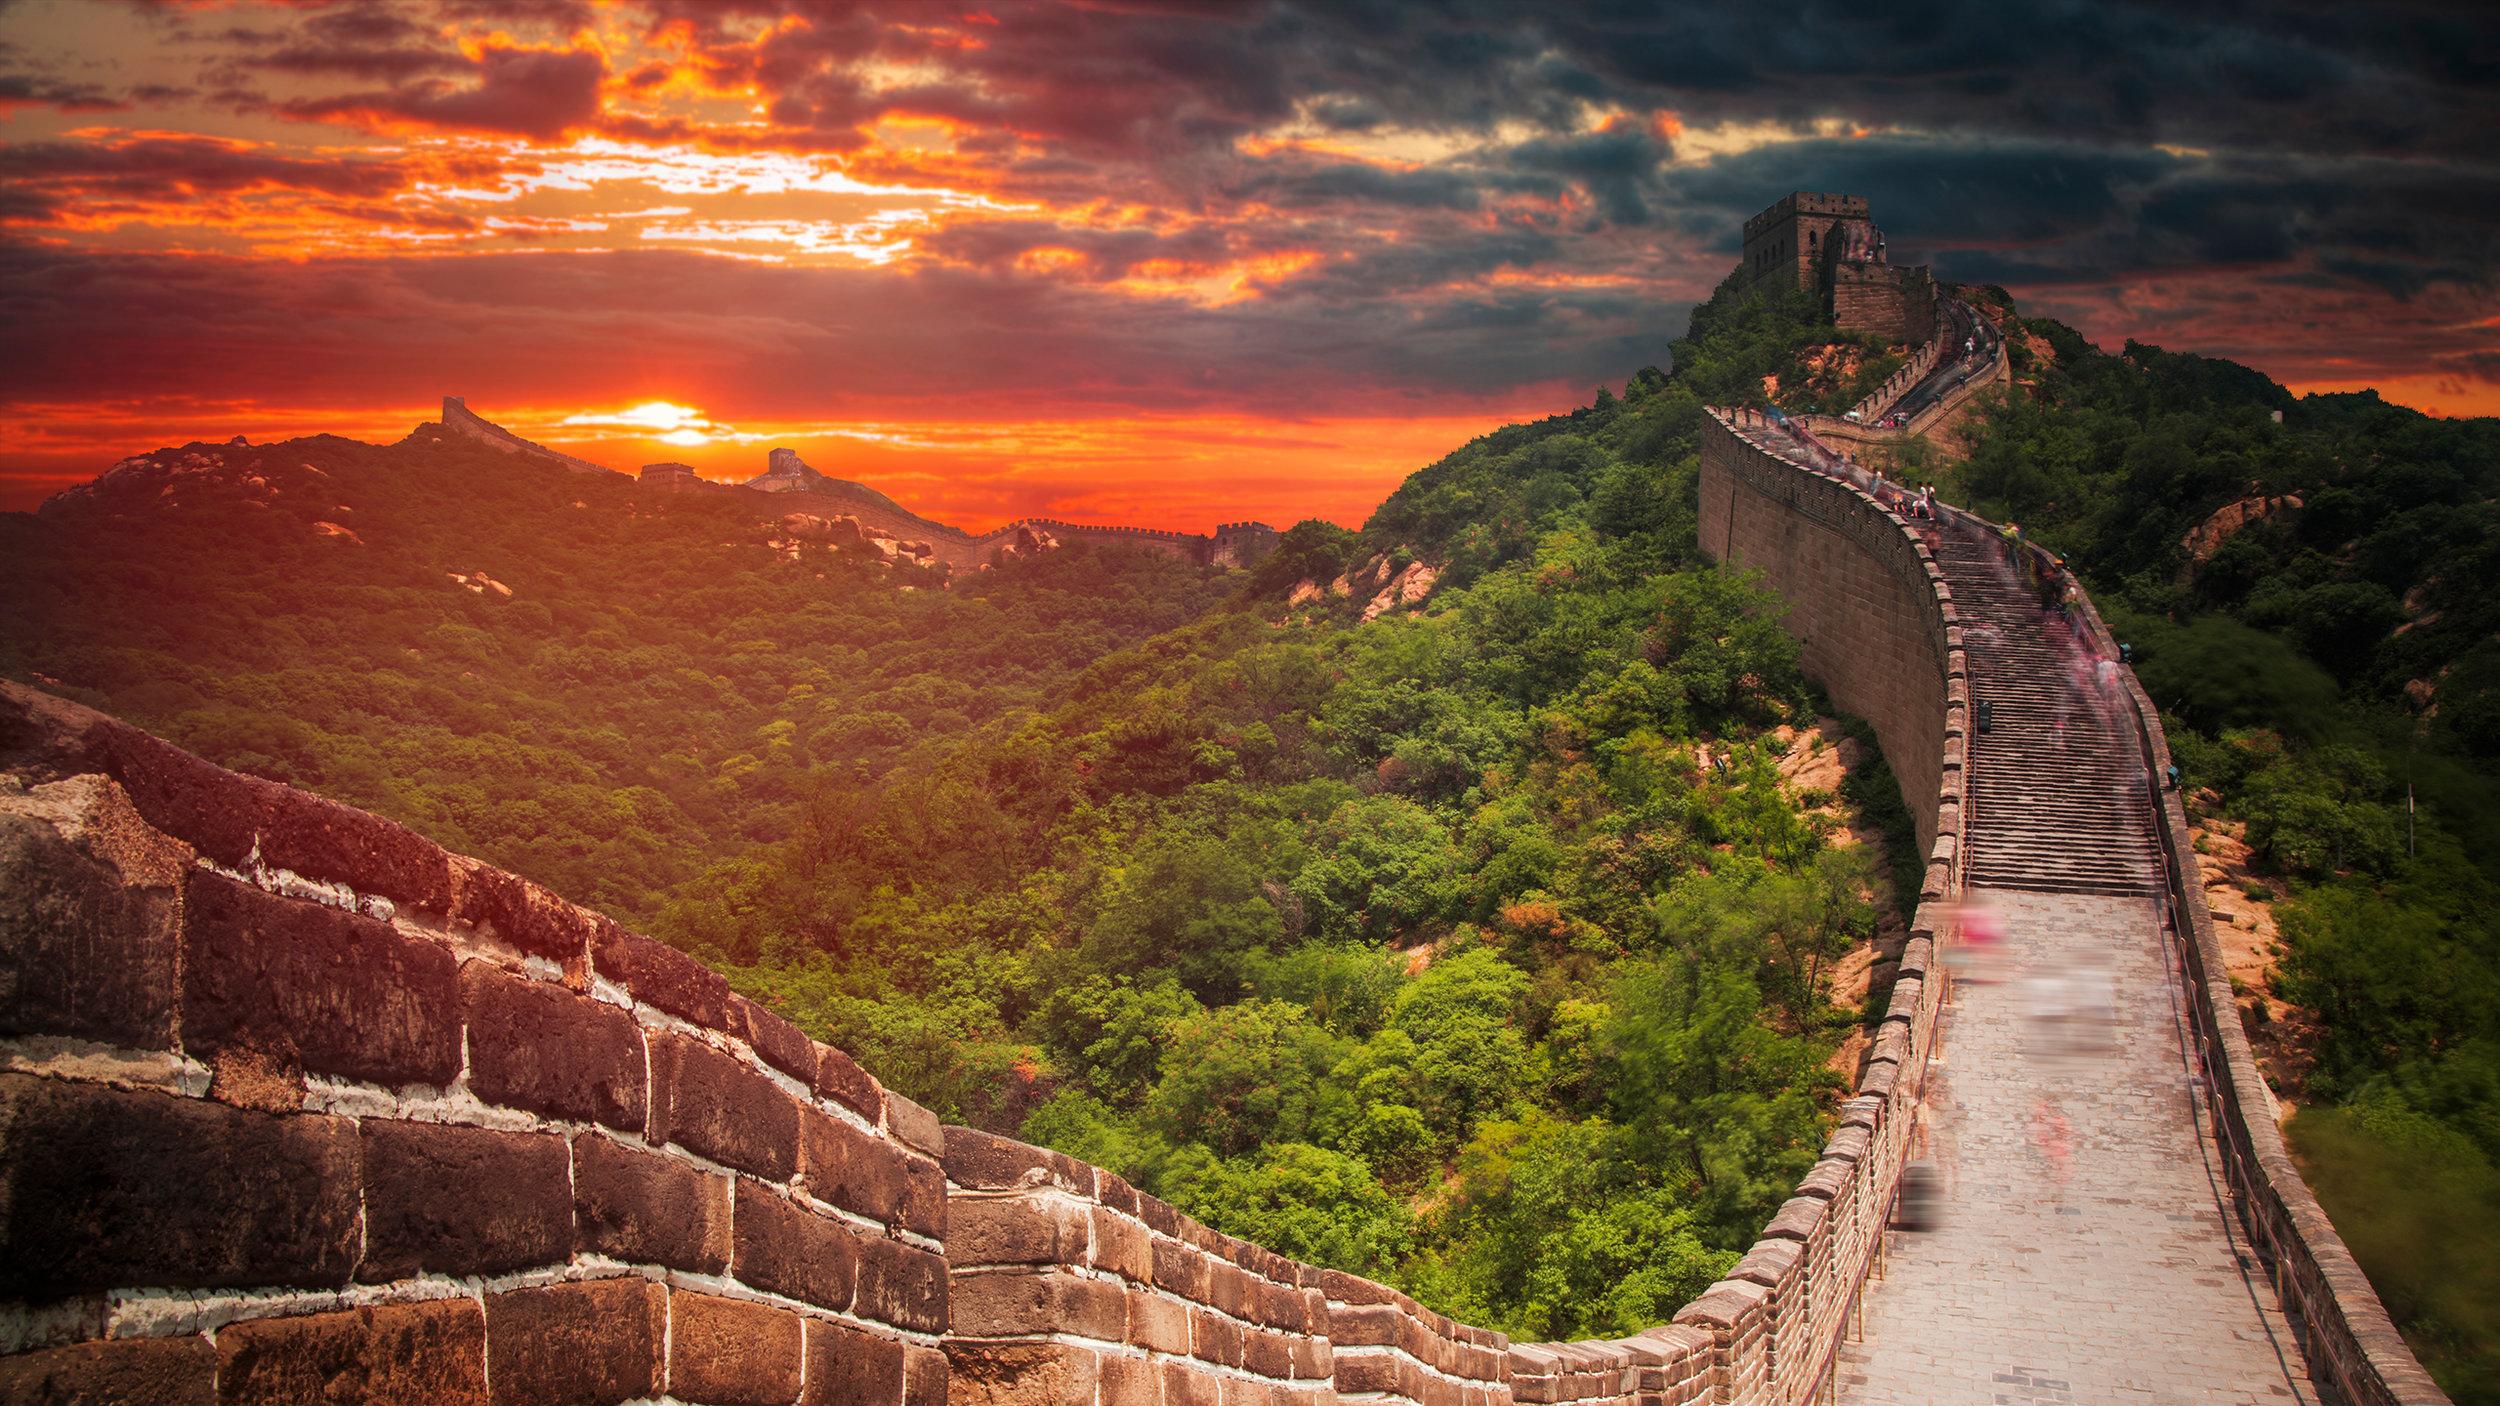 BRENDOVI     Kineski Zid?      Ne.      Tvoj Zid!